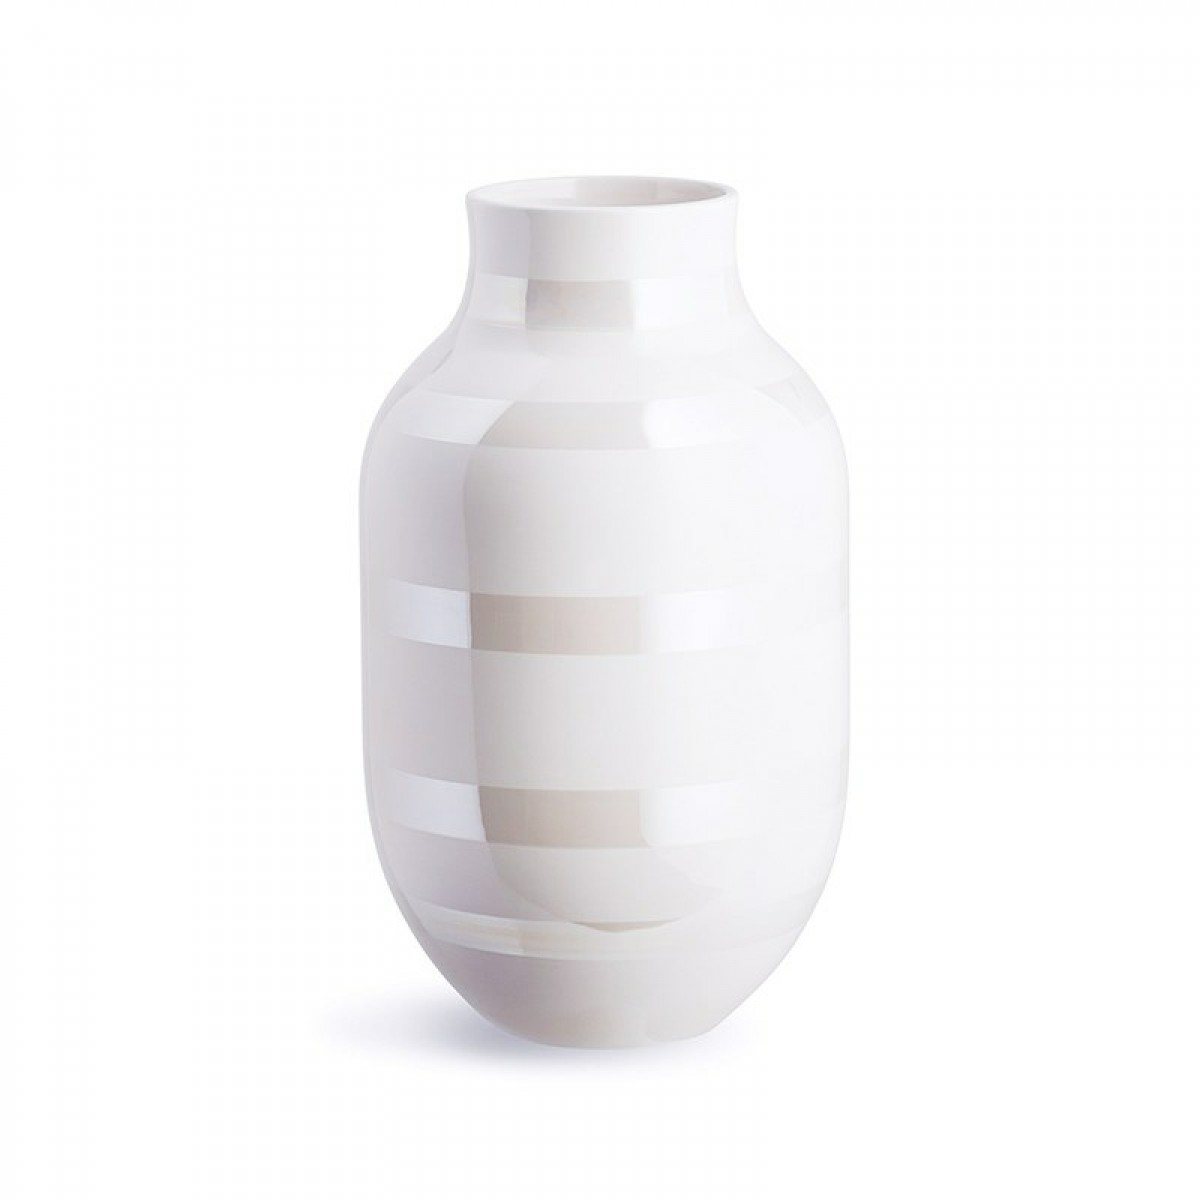 KÄHLER Omaggio vase perlemor 30,5 cm.